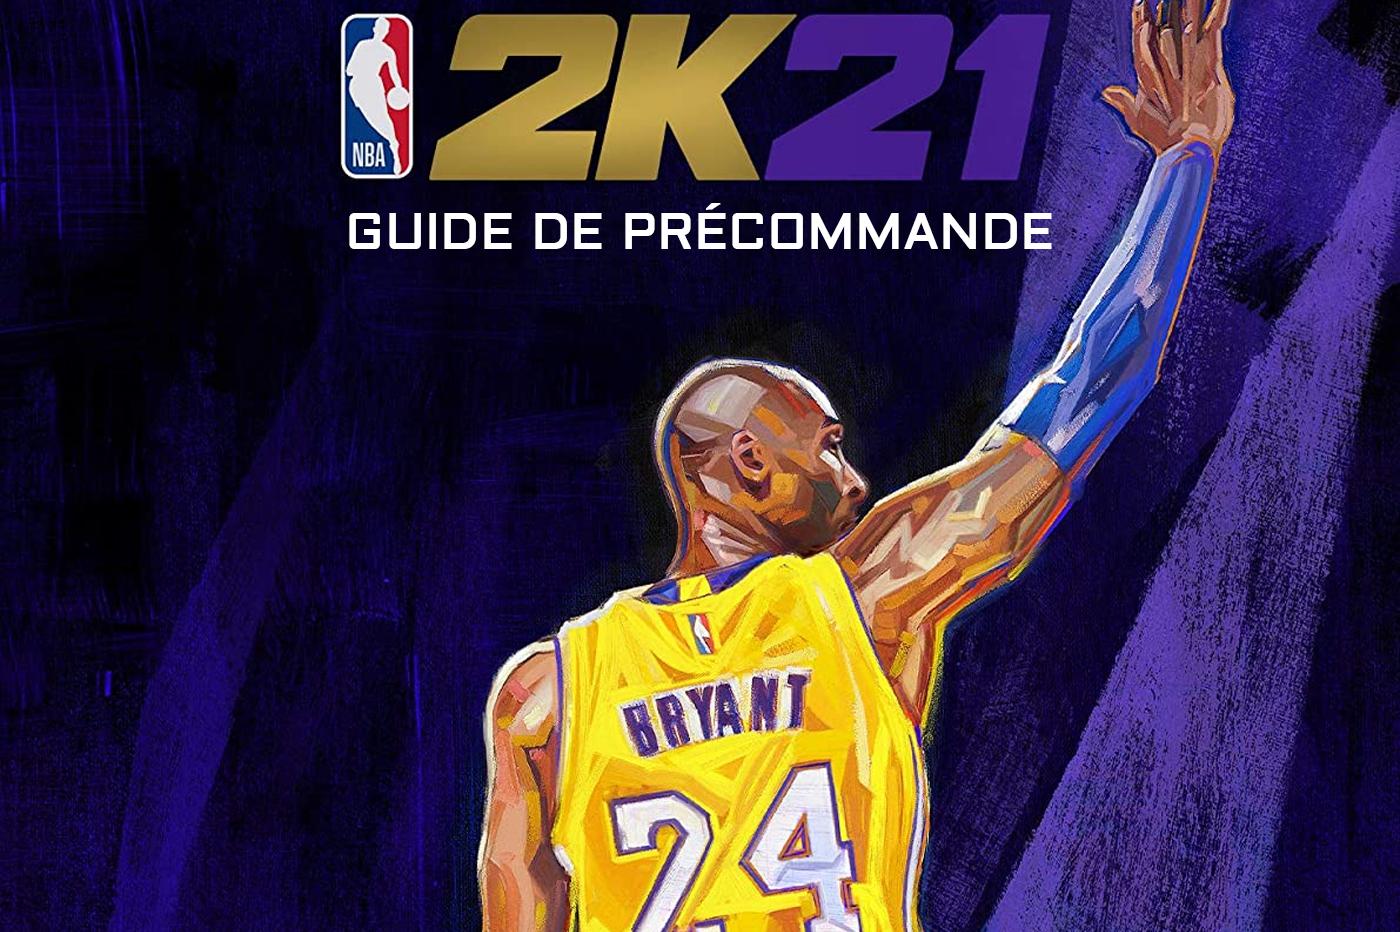 Guide Précommande NBA 2K21 PS5 PlayStation 5 Xbox Series X